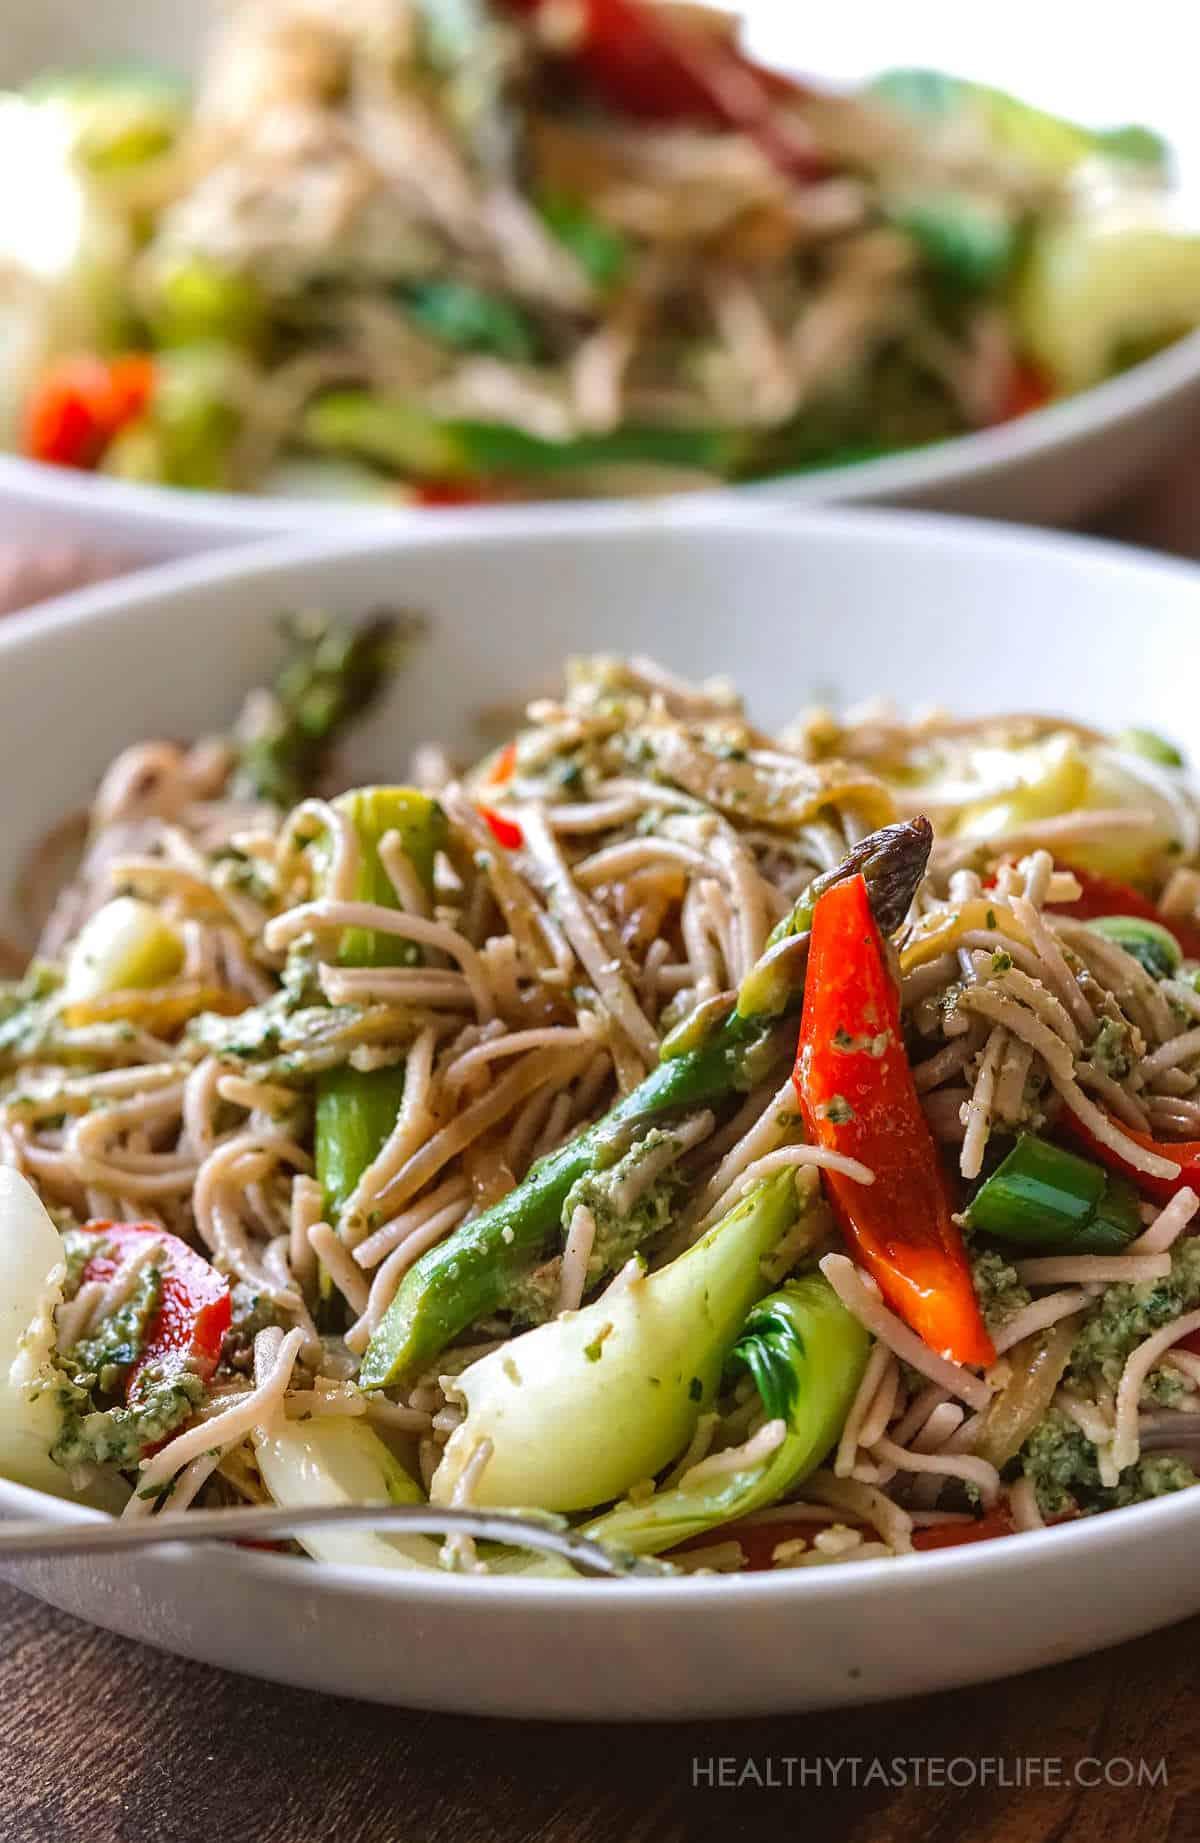 Vegan Gluten Free Soba Noodles Stir Fry With Creamy Basil Pesto Sauce.